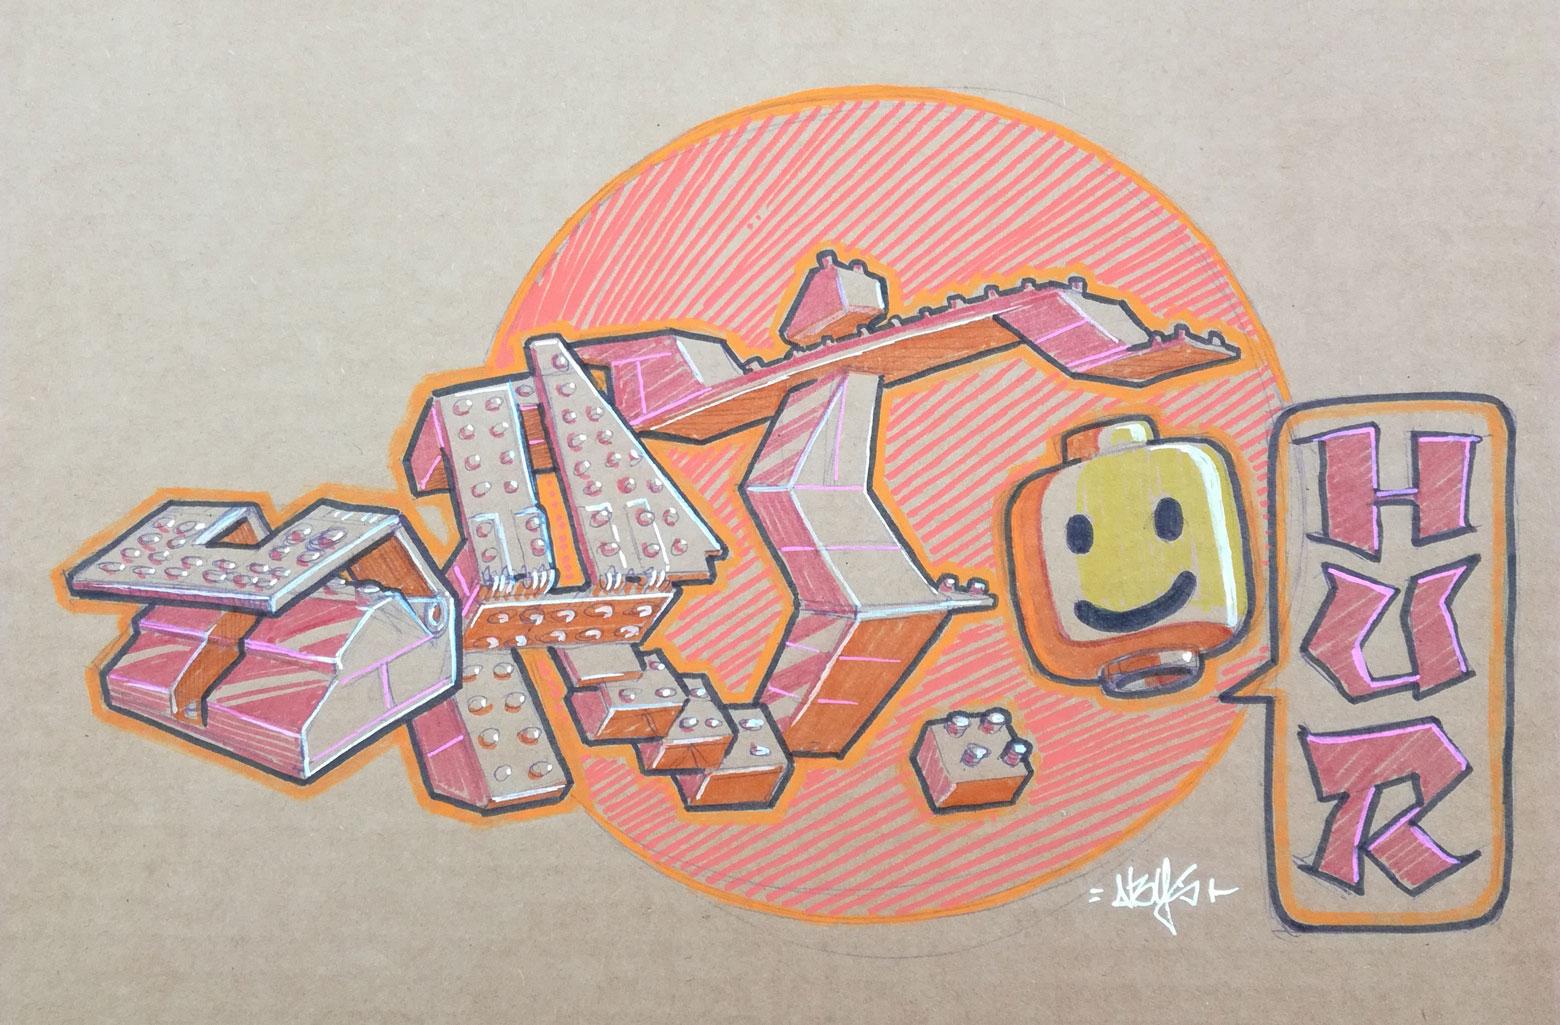 sketchbook - graffiti art - illustration - abys 2 fly - lego - streetart